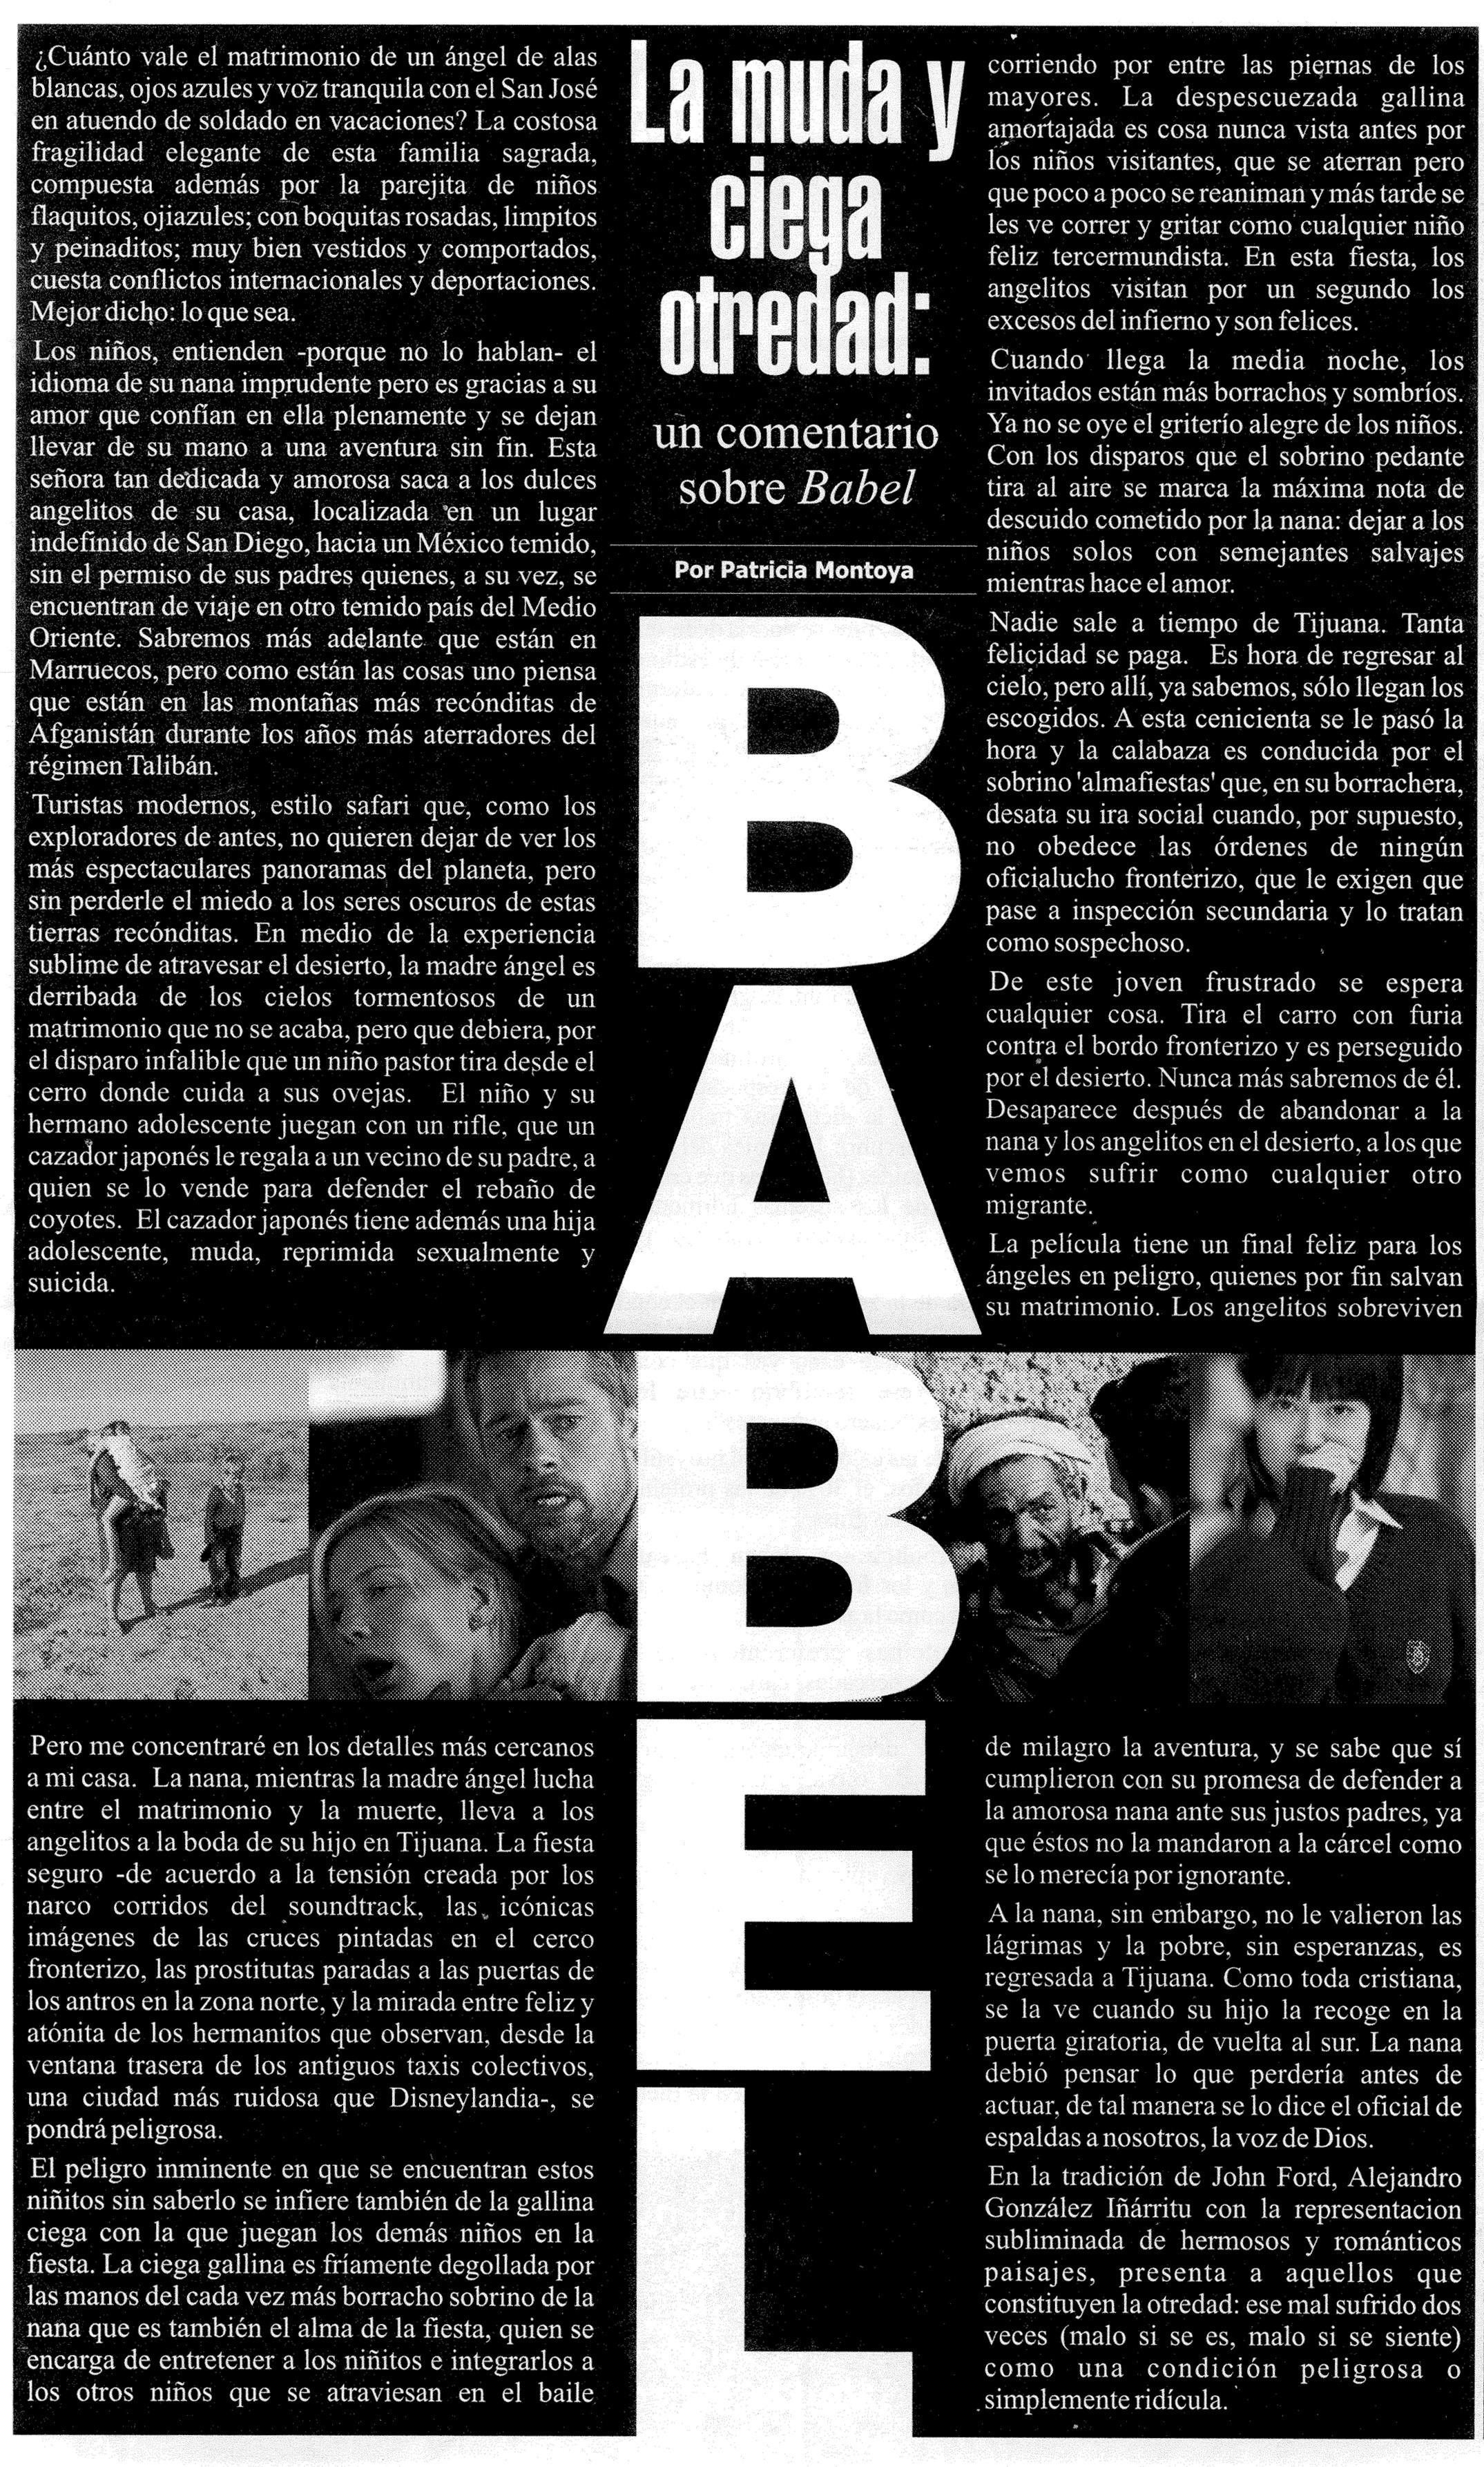 5b-Babel 3.jpg